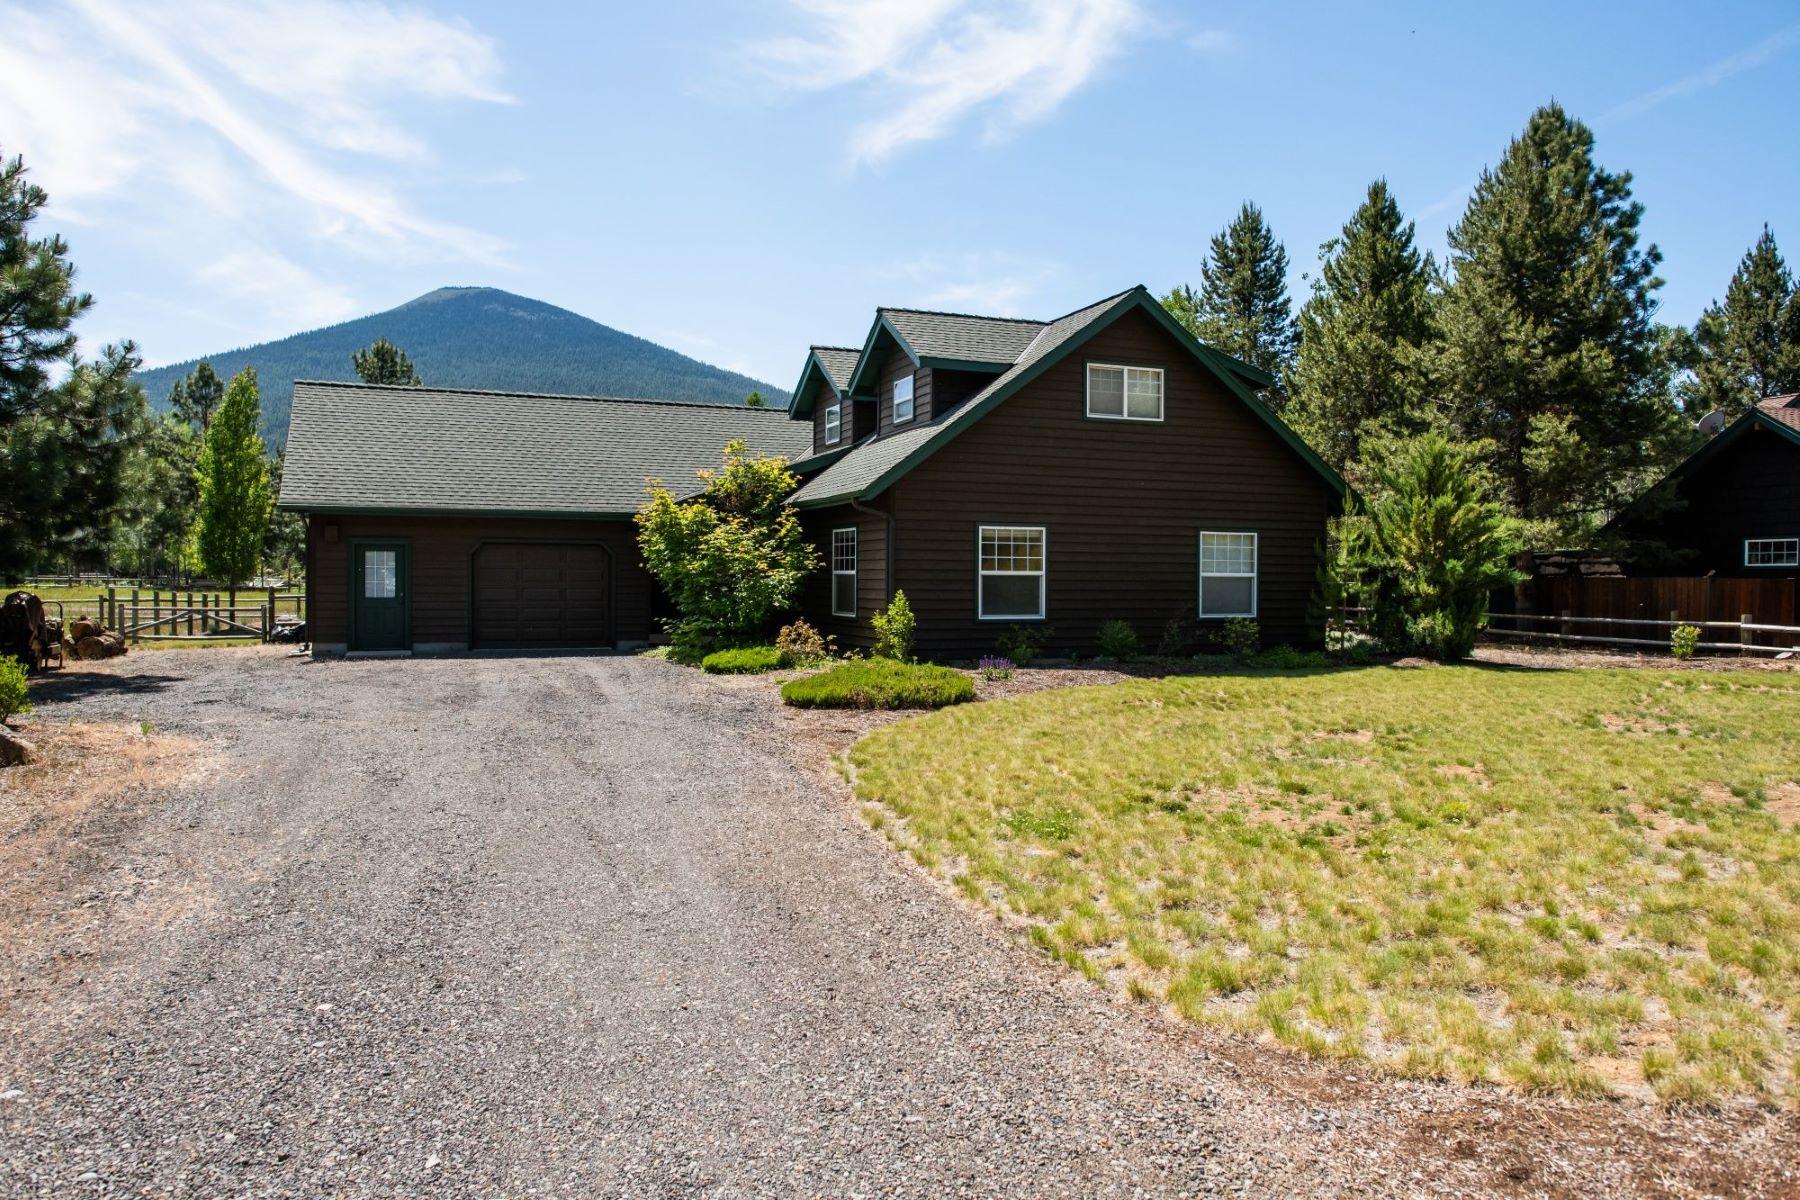 26281 SW Metolius Meadows Drive #Lot11 Camp Sherman, OR 97730 26281 Metolius Meadows Dr, Camp Sherman, Oregon 97730 Hoa Kỳ